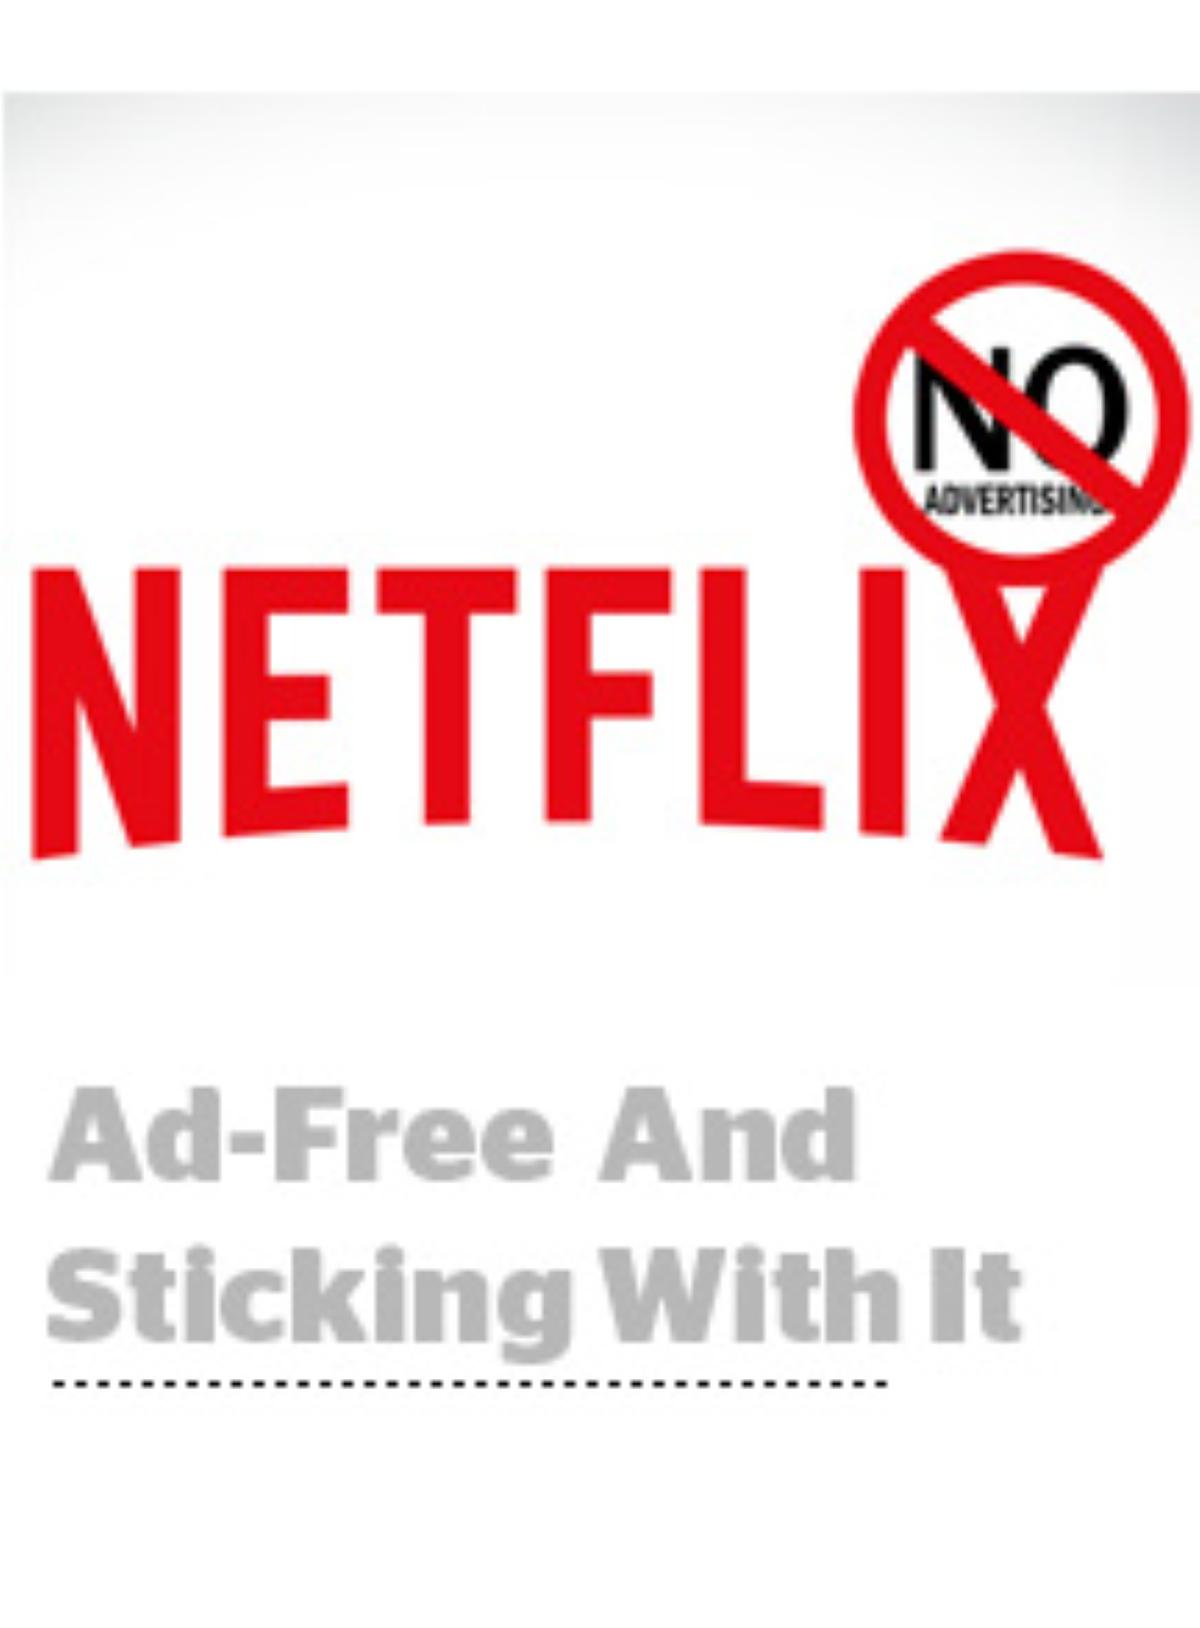 Netflix's No-Ads / Ad-Free Service Pledge